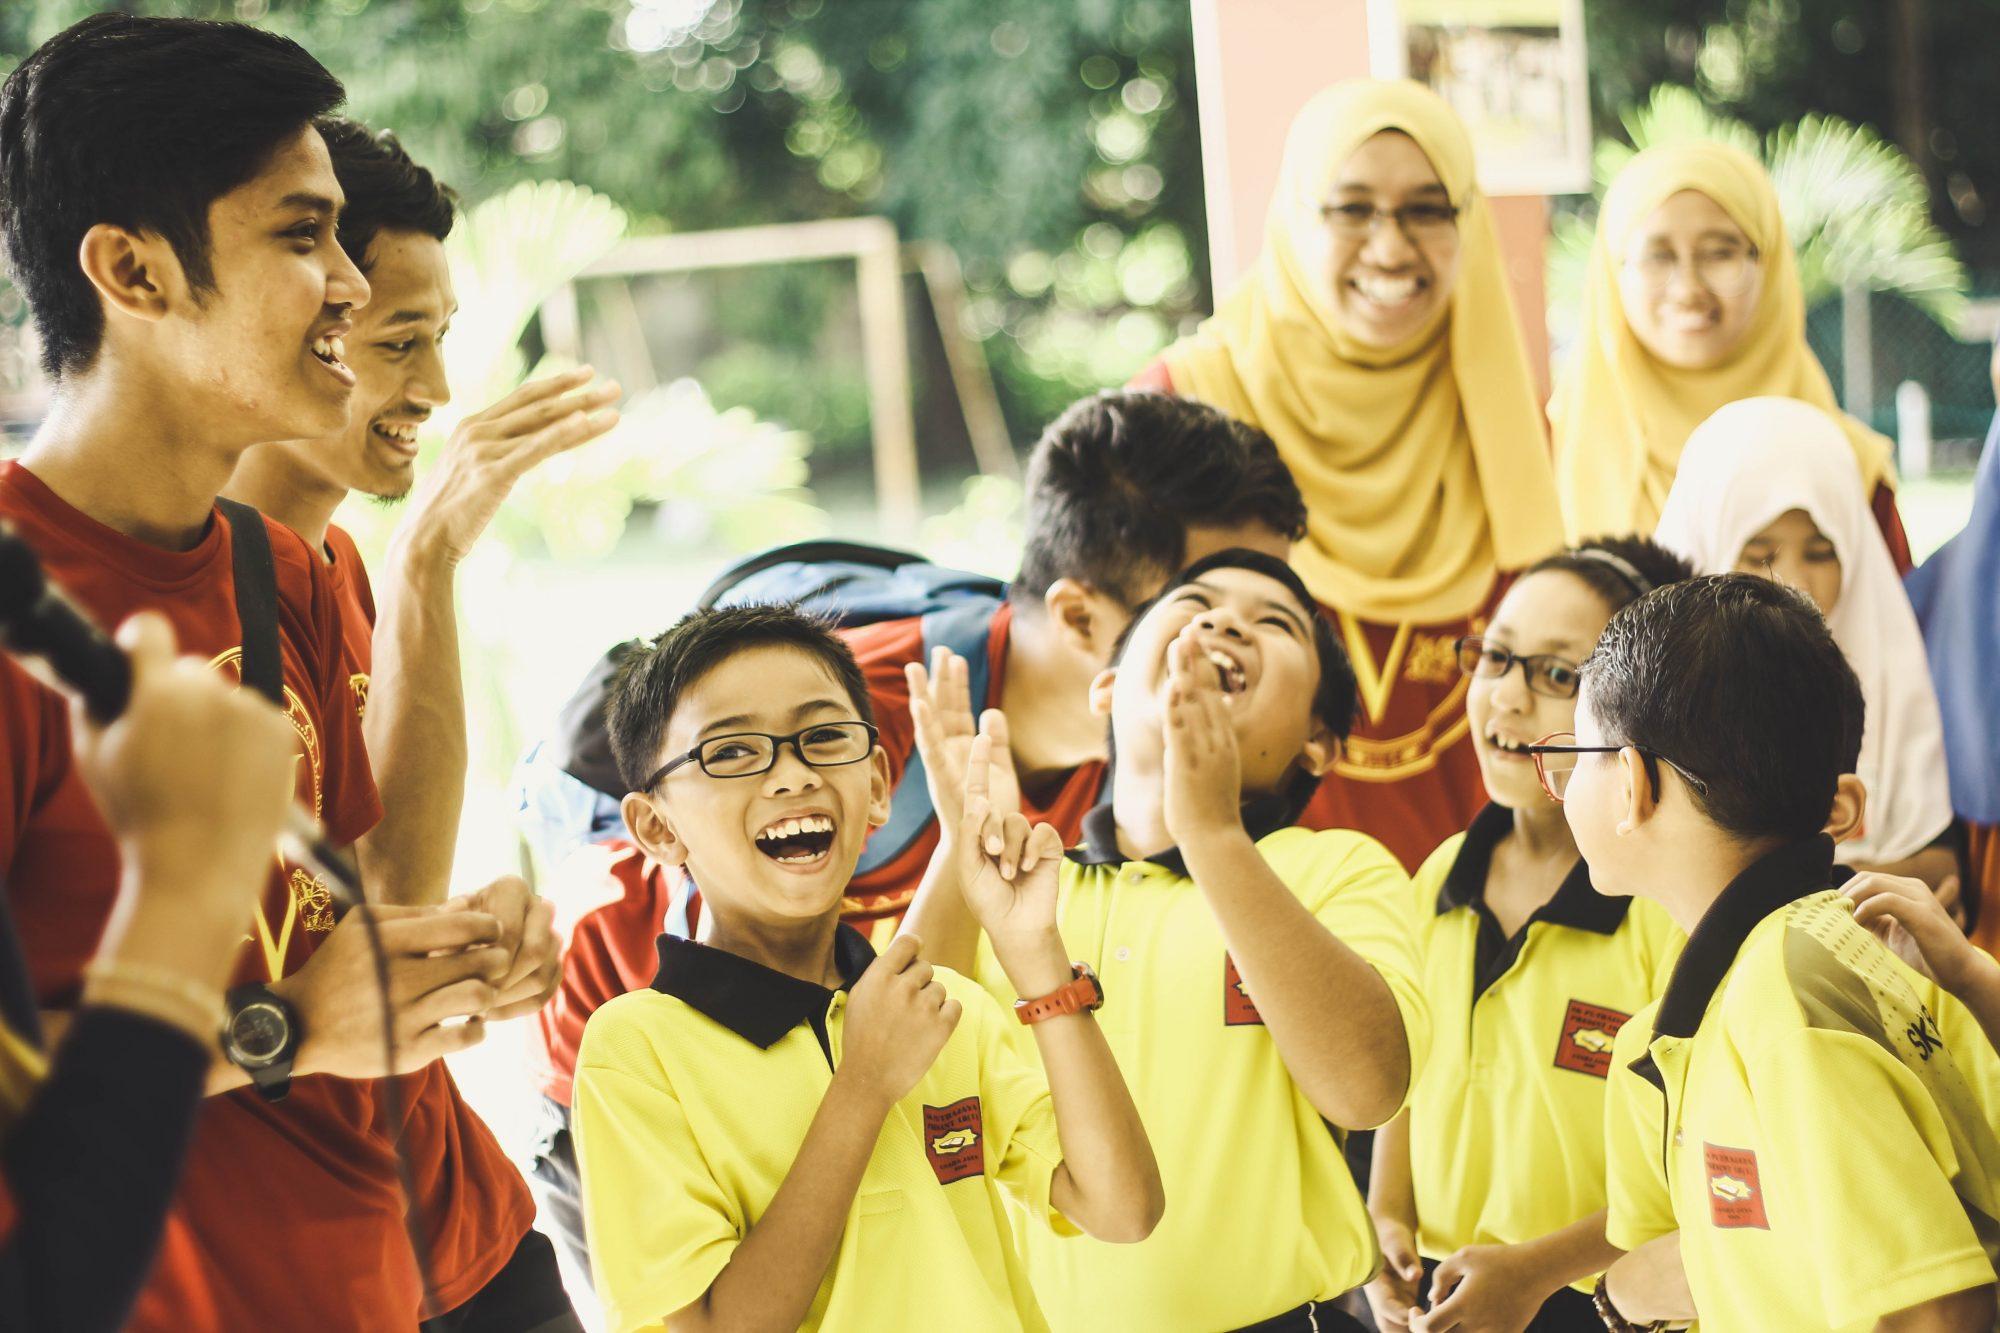 celebration-children-daytime-1206101